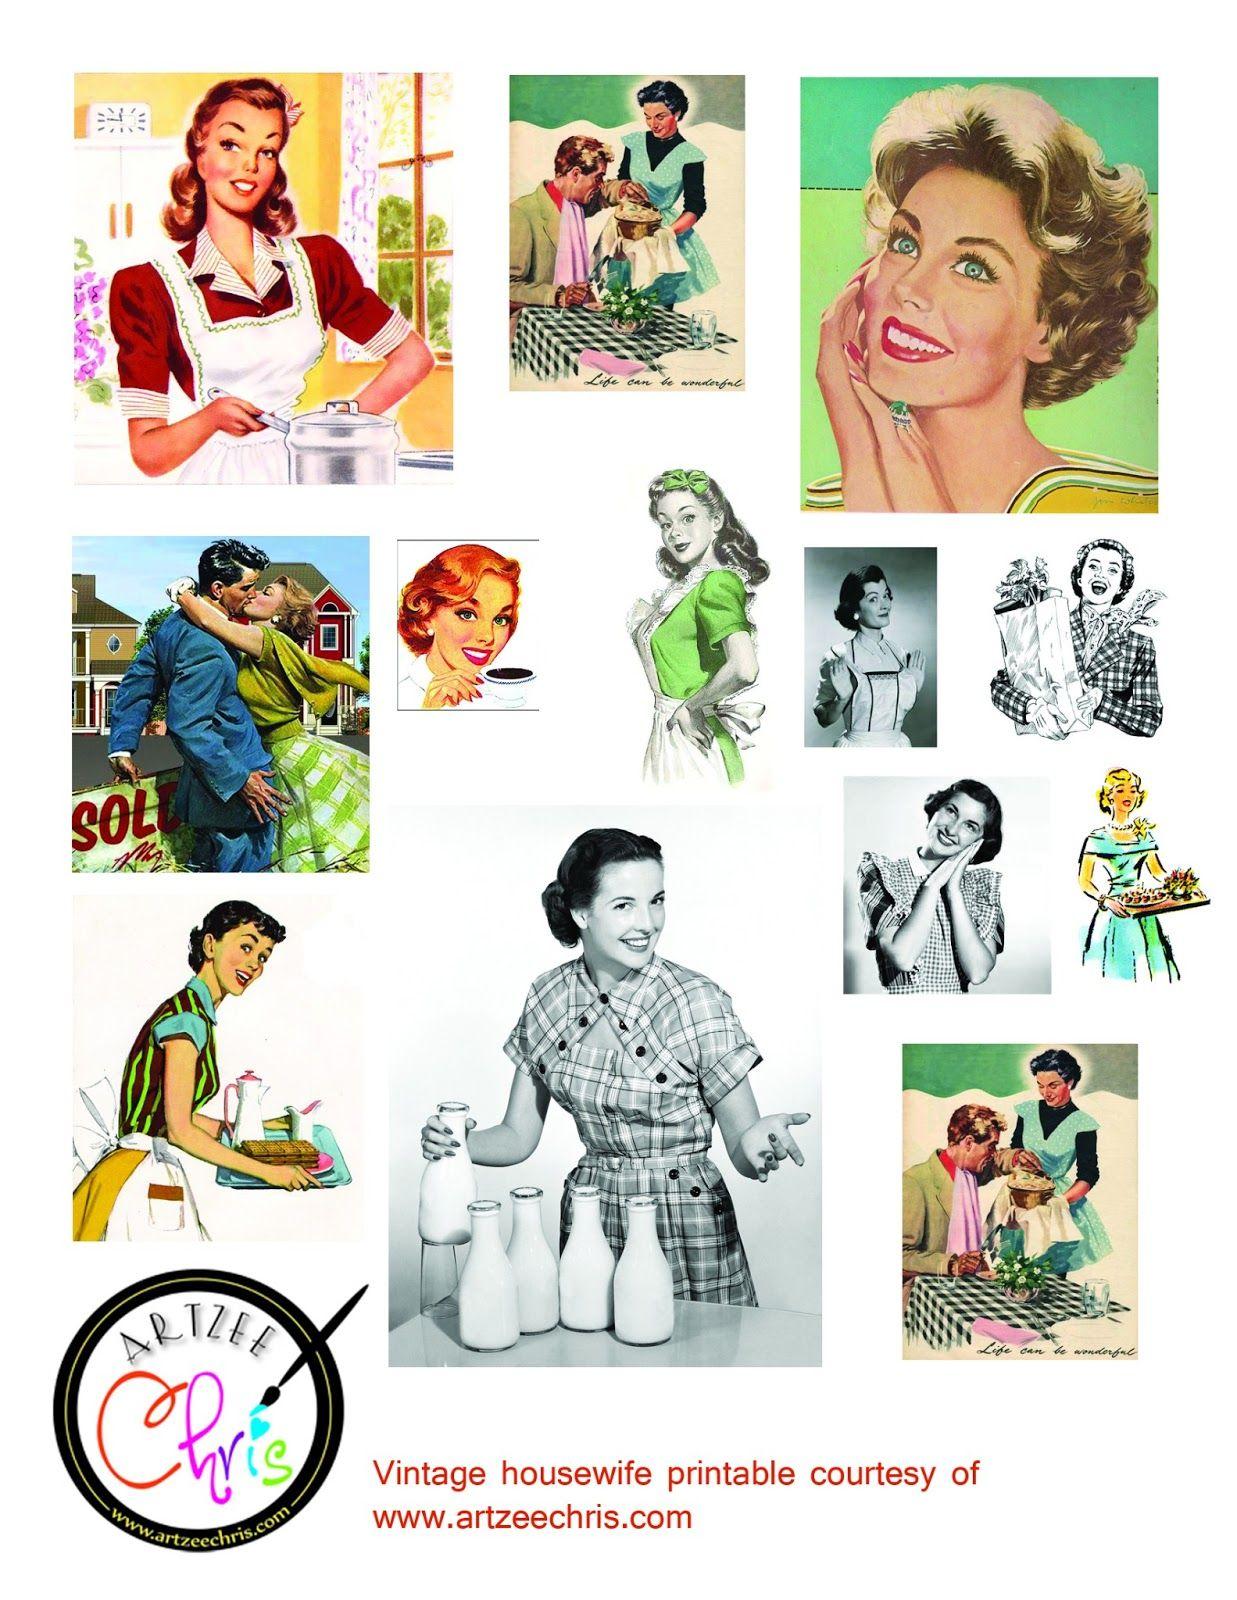 The Artzee Blog: Free Retro Vintage 1950s Housewife.